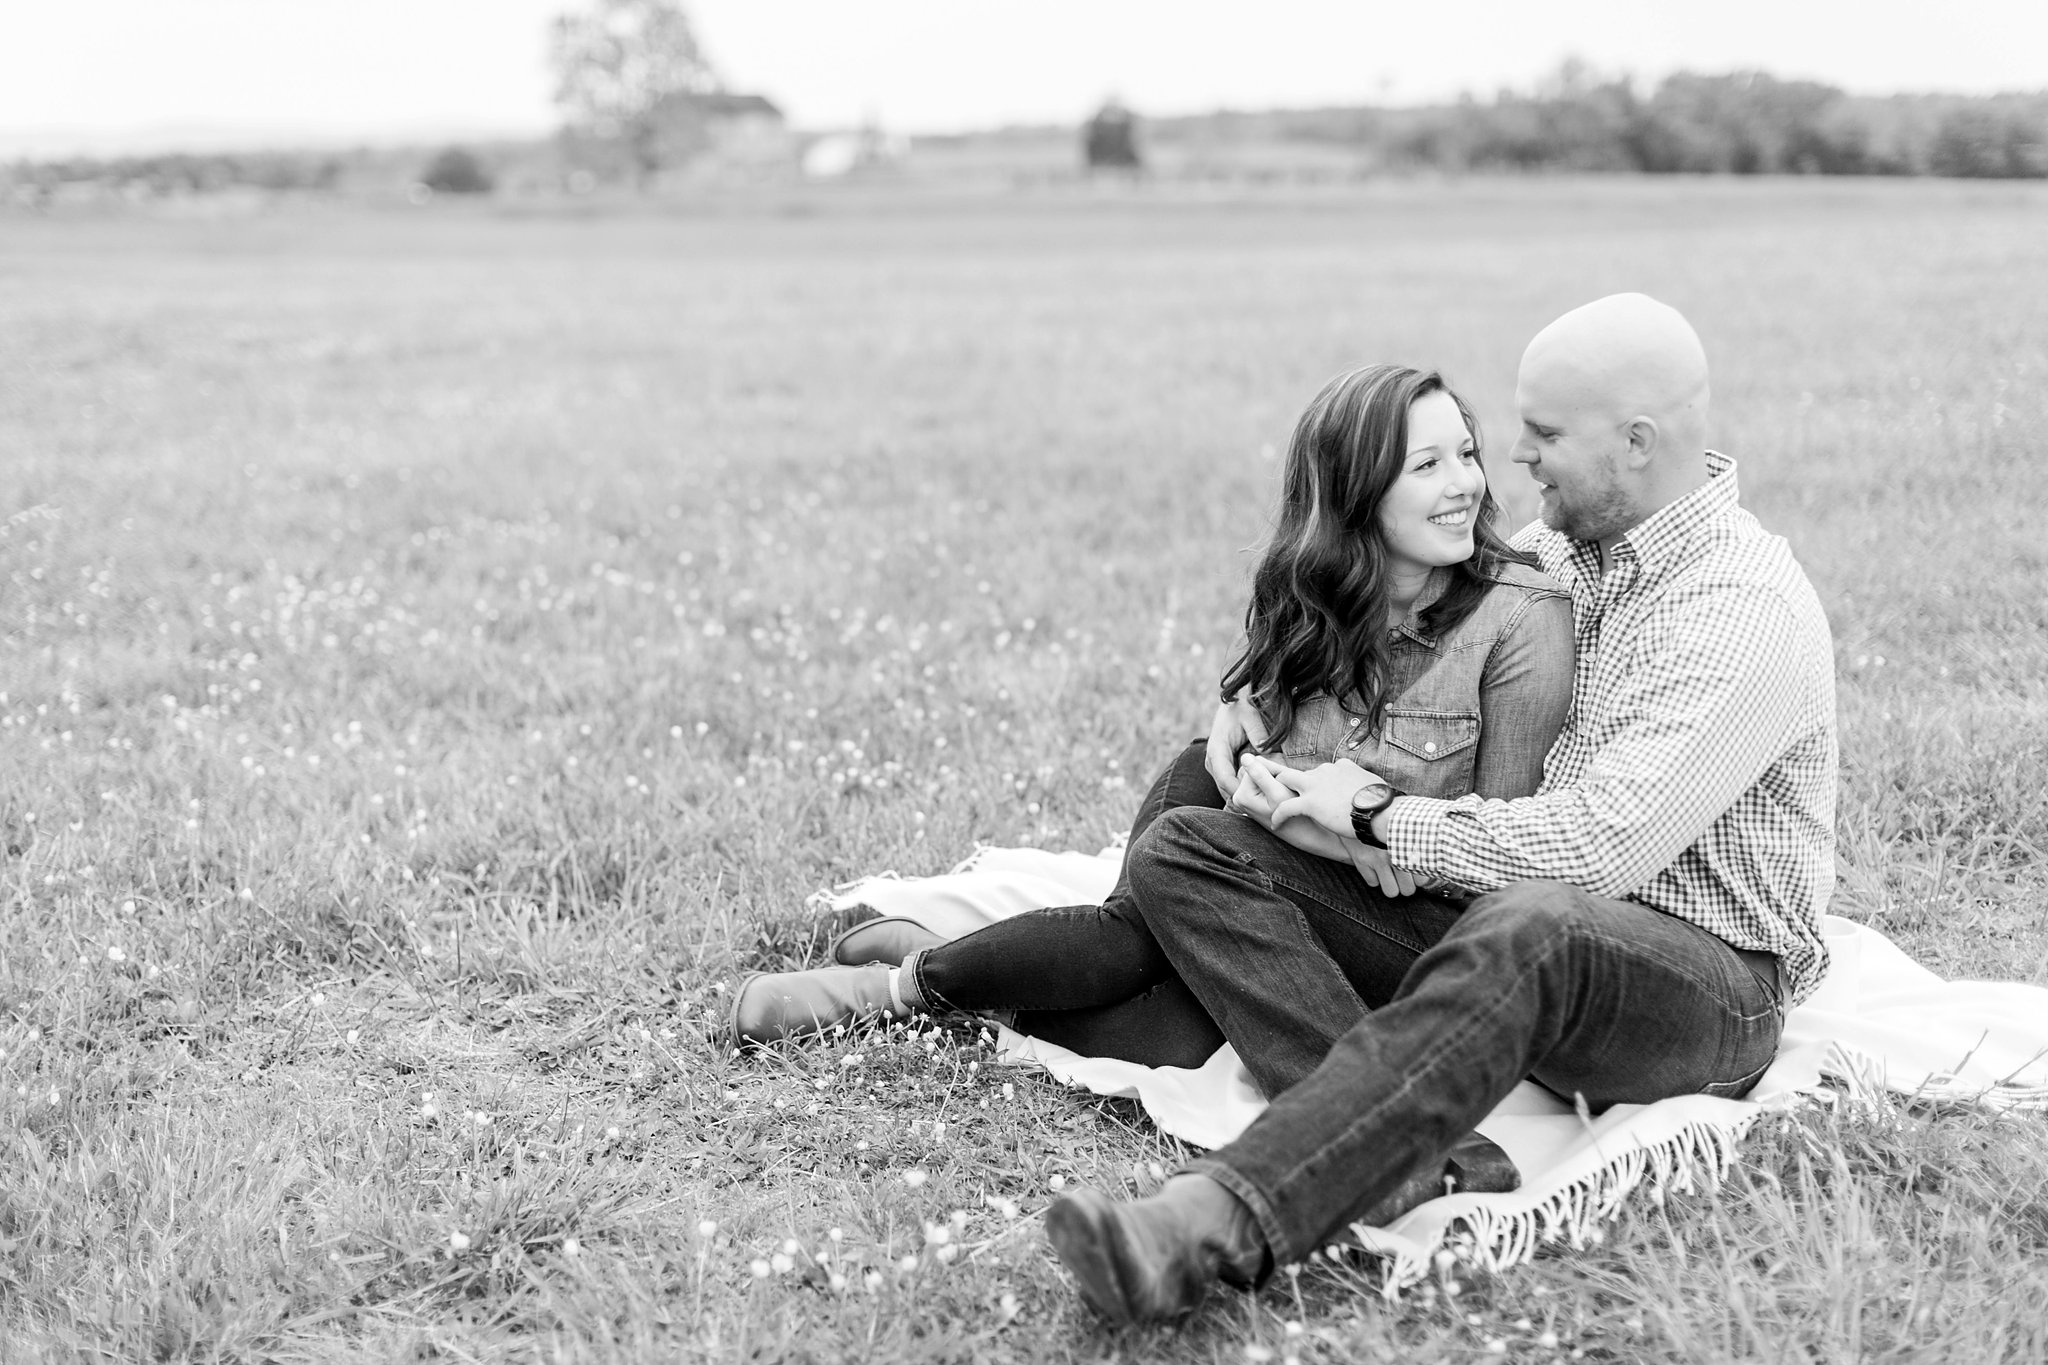 Old Town Manassas Battlefield Engagement Photos Virginia Wedding Photographer Jessica & Jason-126.jpg